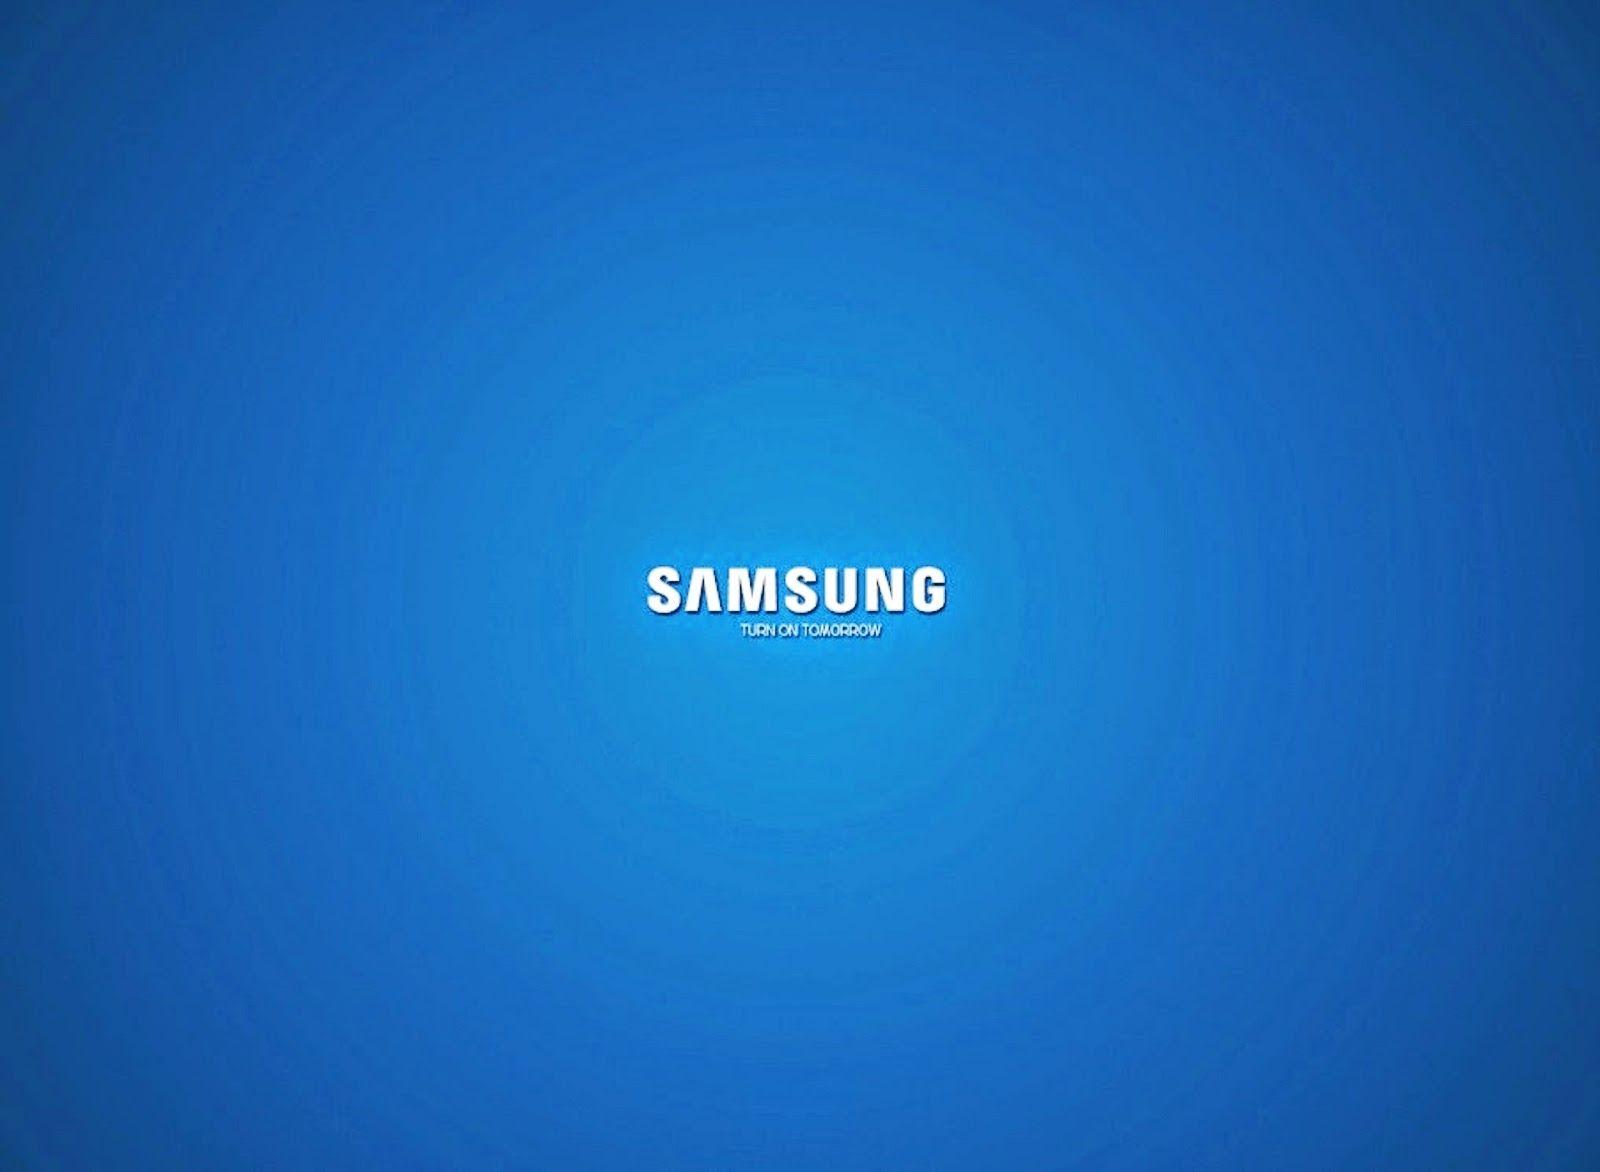 Hd wallpaper samsung - Samsung Hd Wallpaper 720 1280 Samsung Hd Wallpapers 30 Wallpapers Adorable Wallpapers